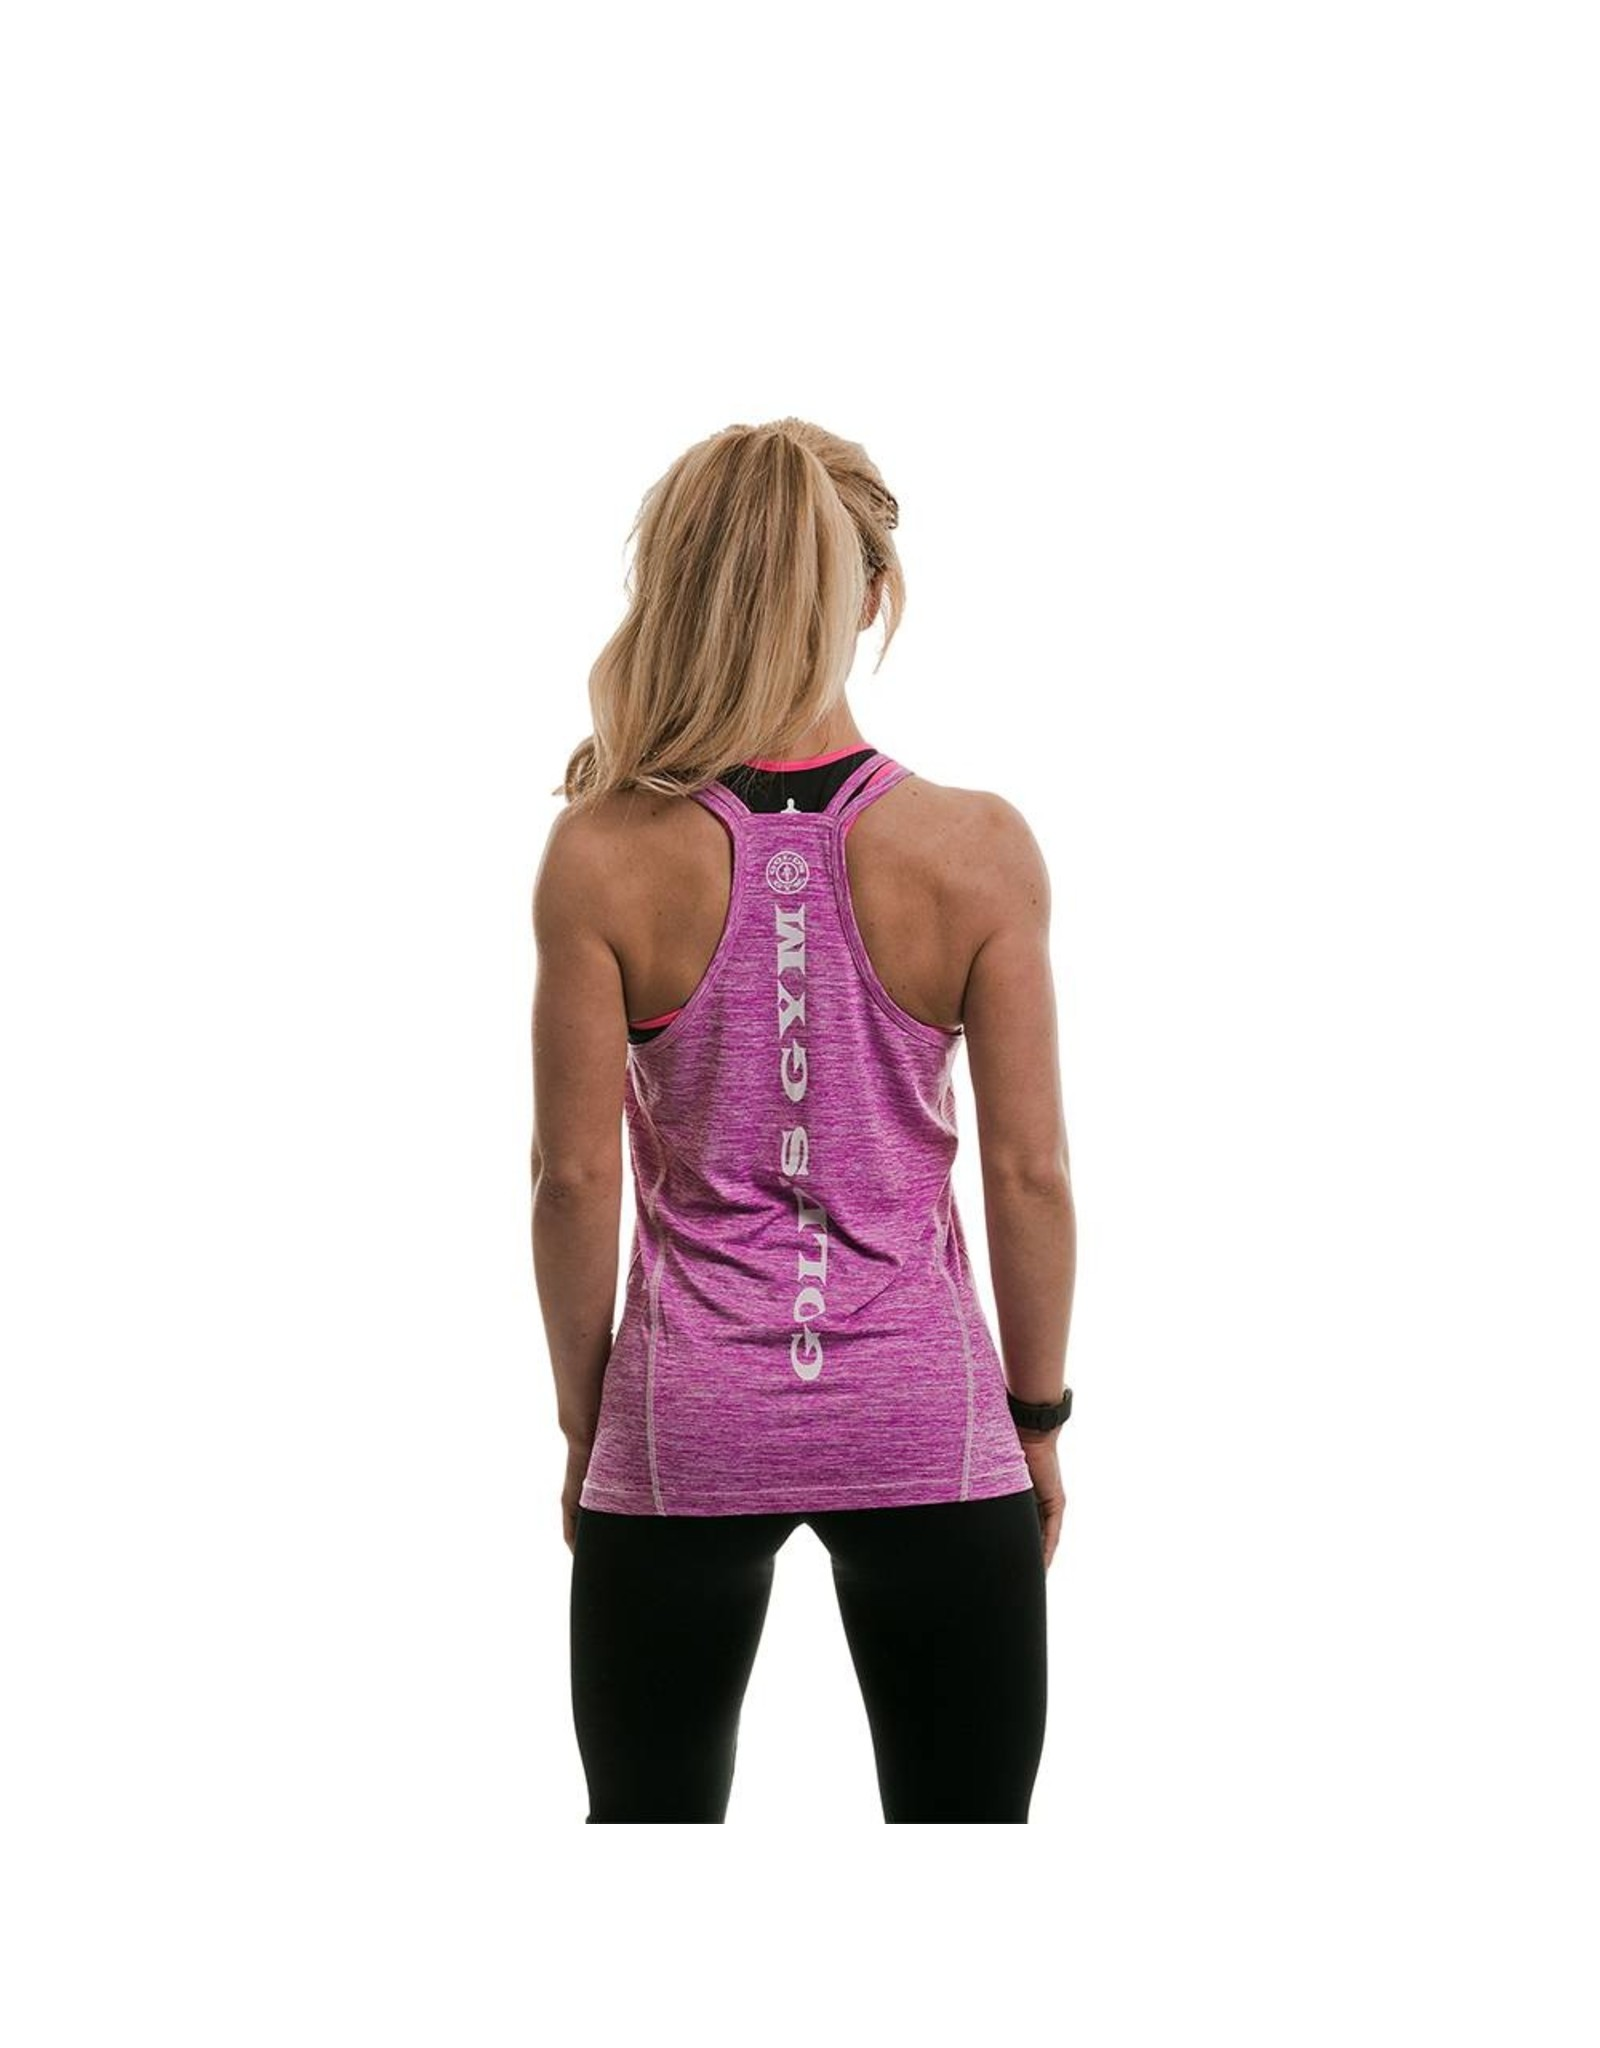 Gold's Gym Performance Ladies Vest - Lilac Marl